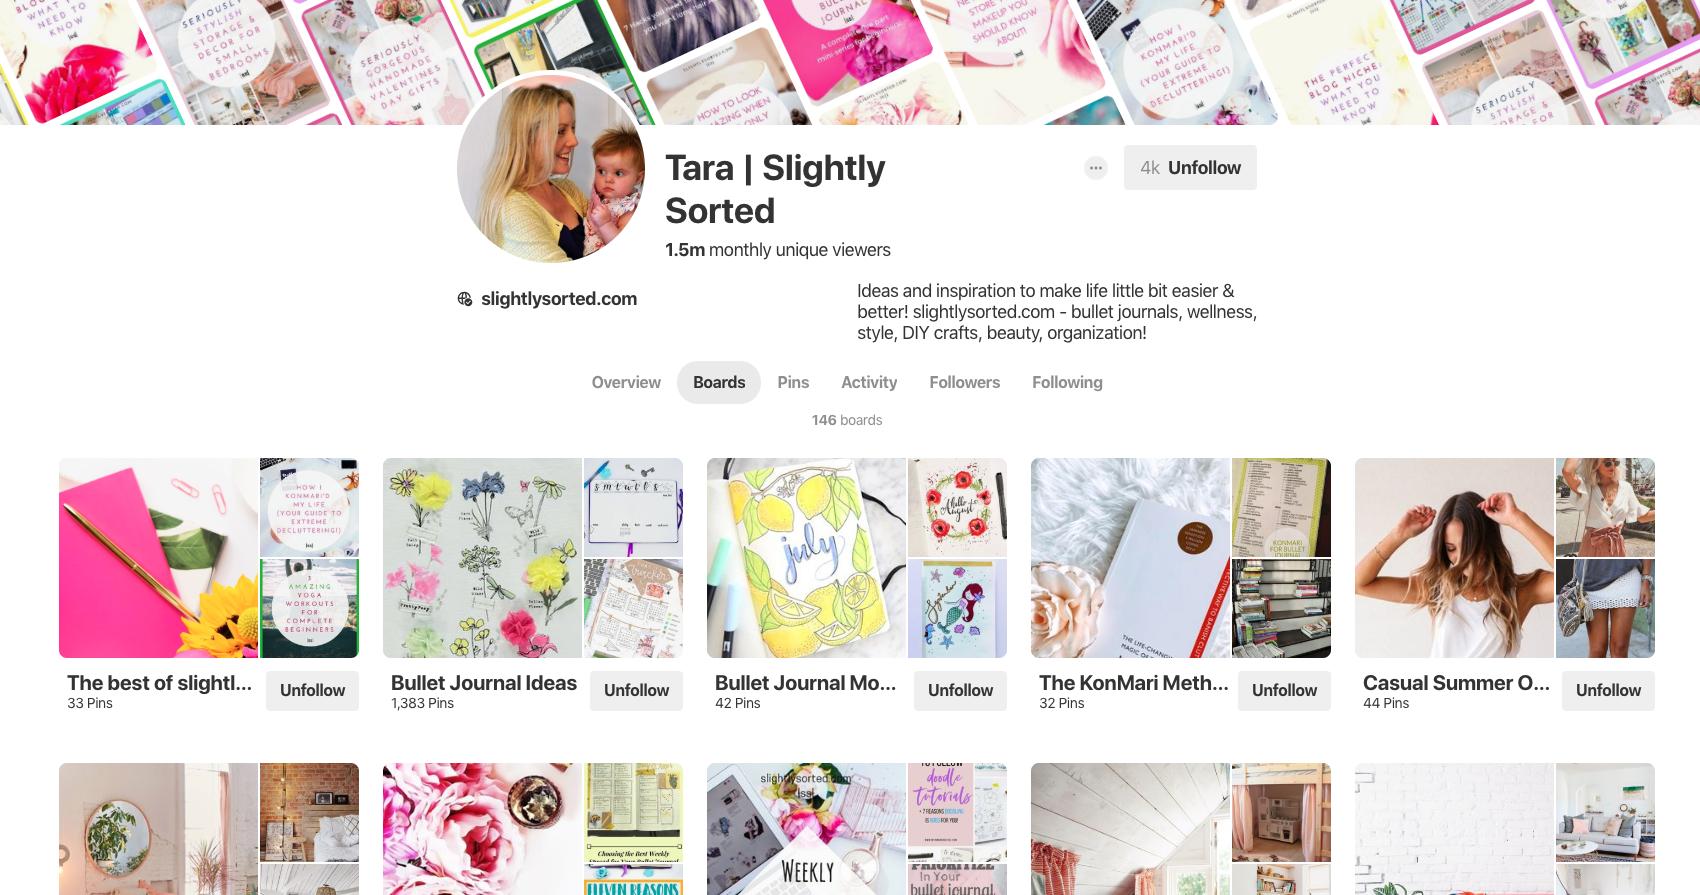 Self Care Ideas on Pinterest